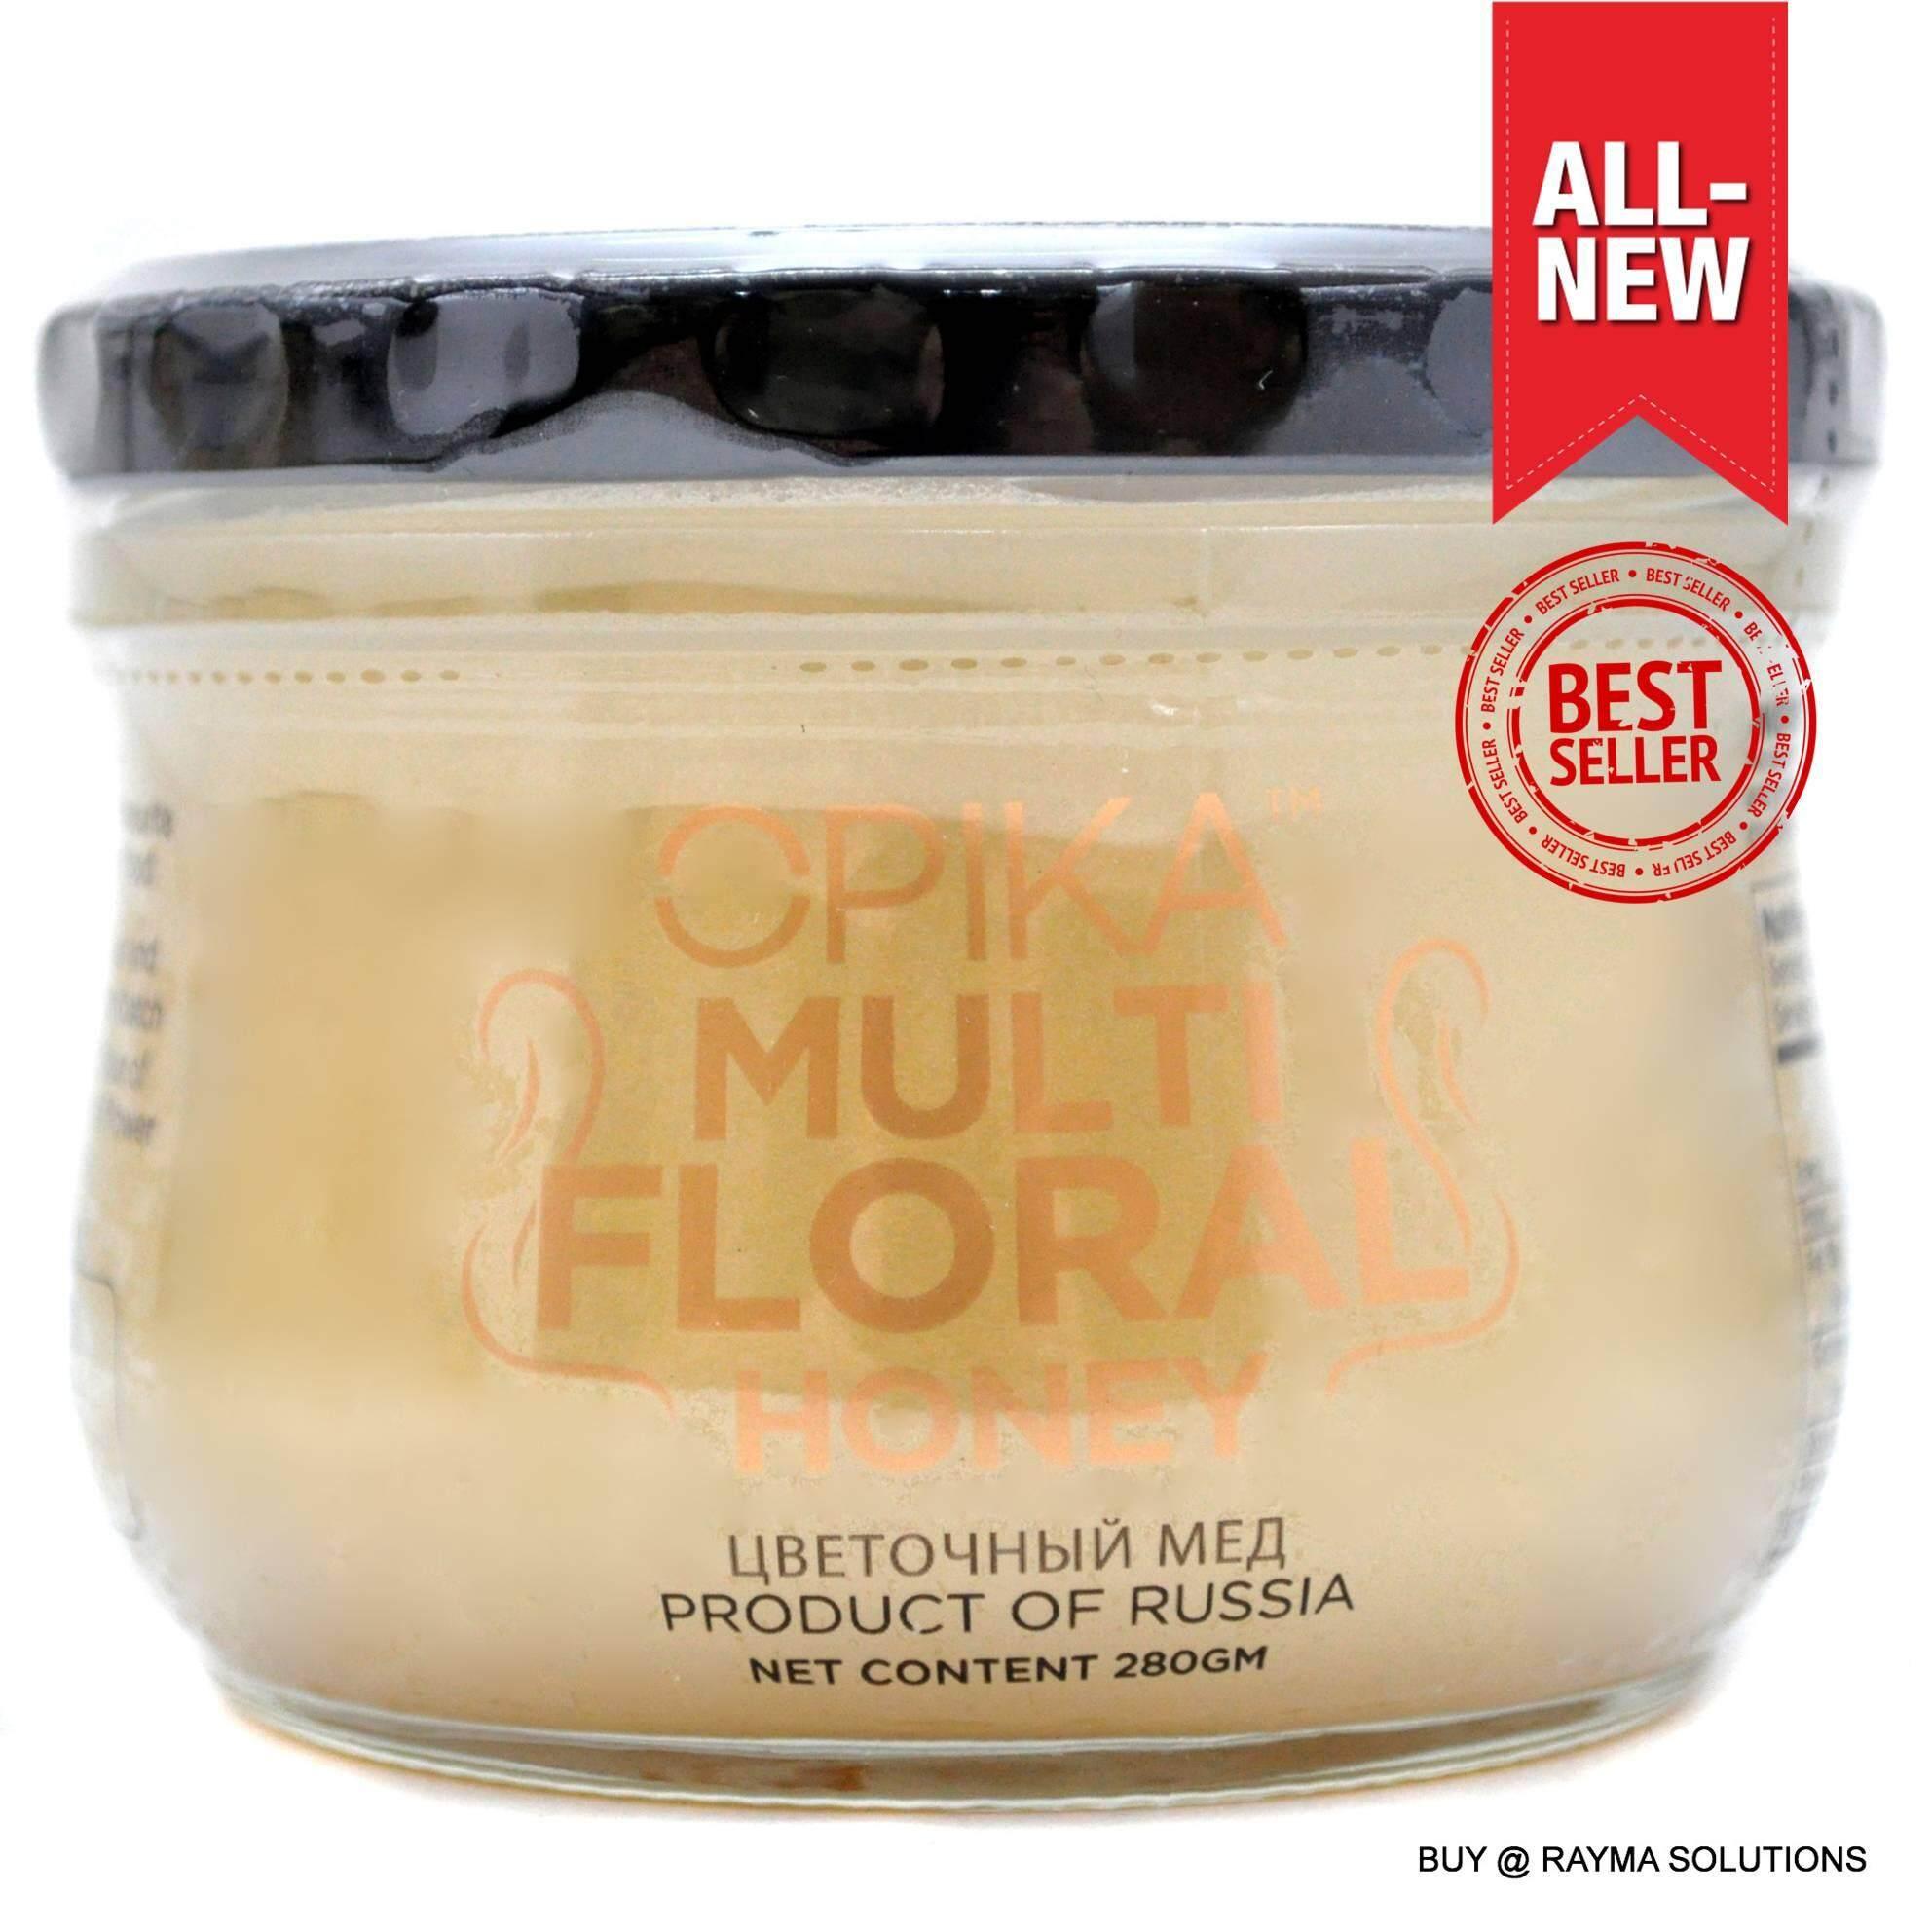 OPIKA Multi Floral Russian Honey 280g